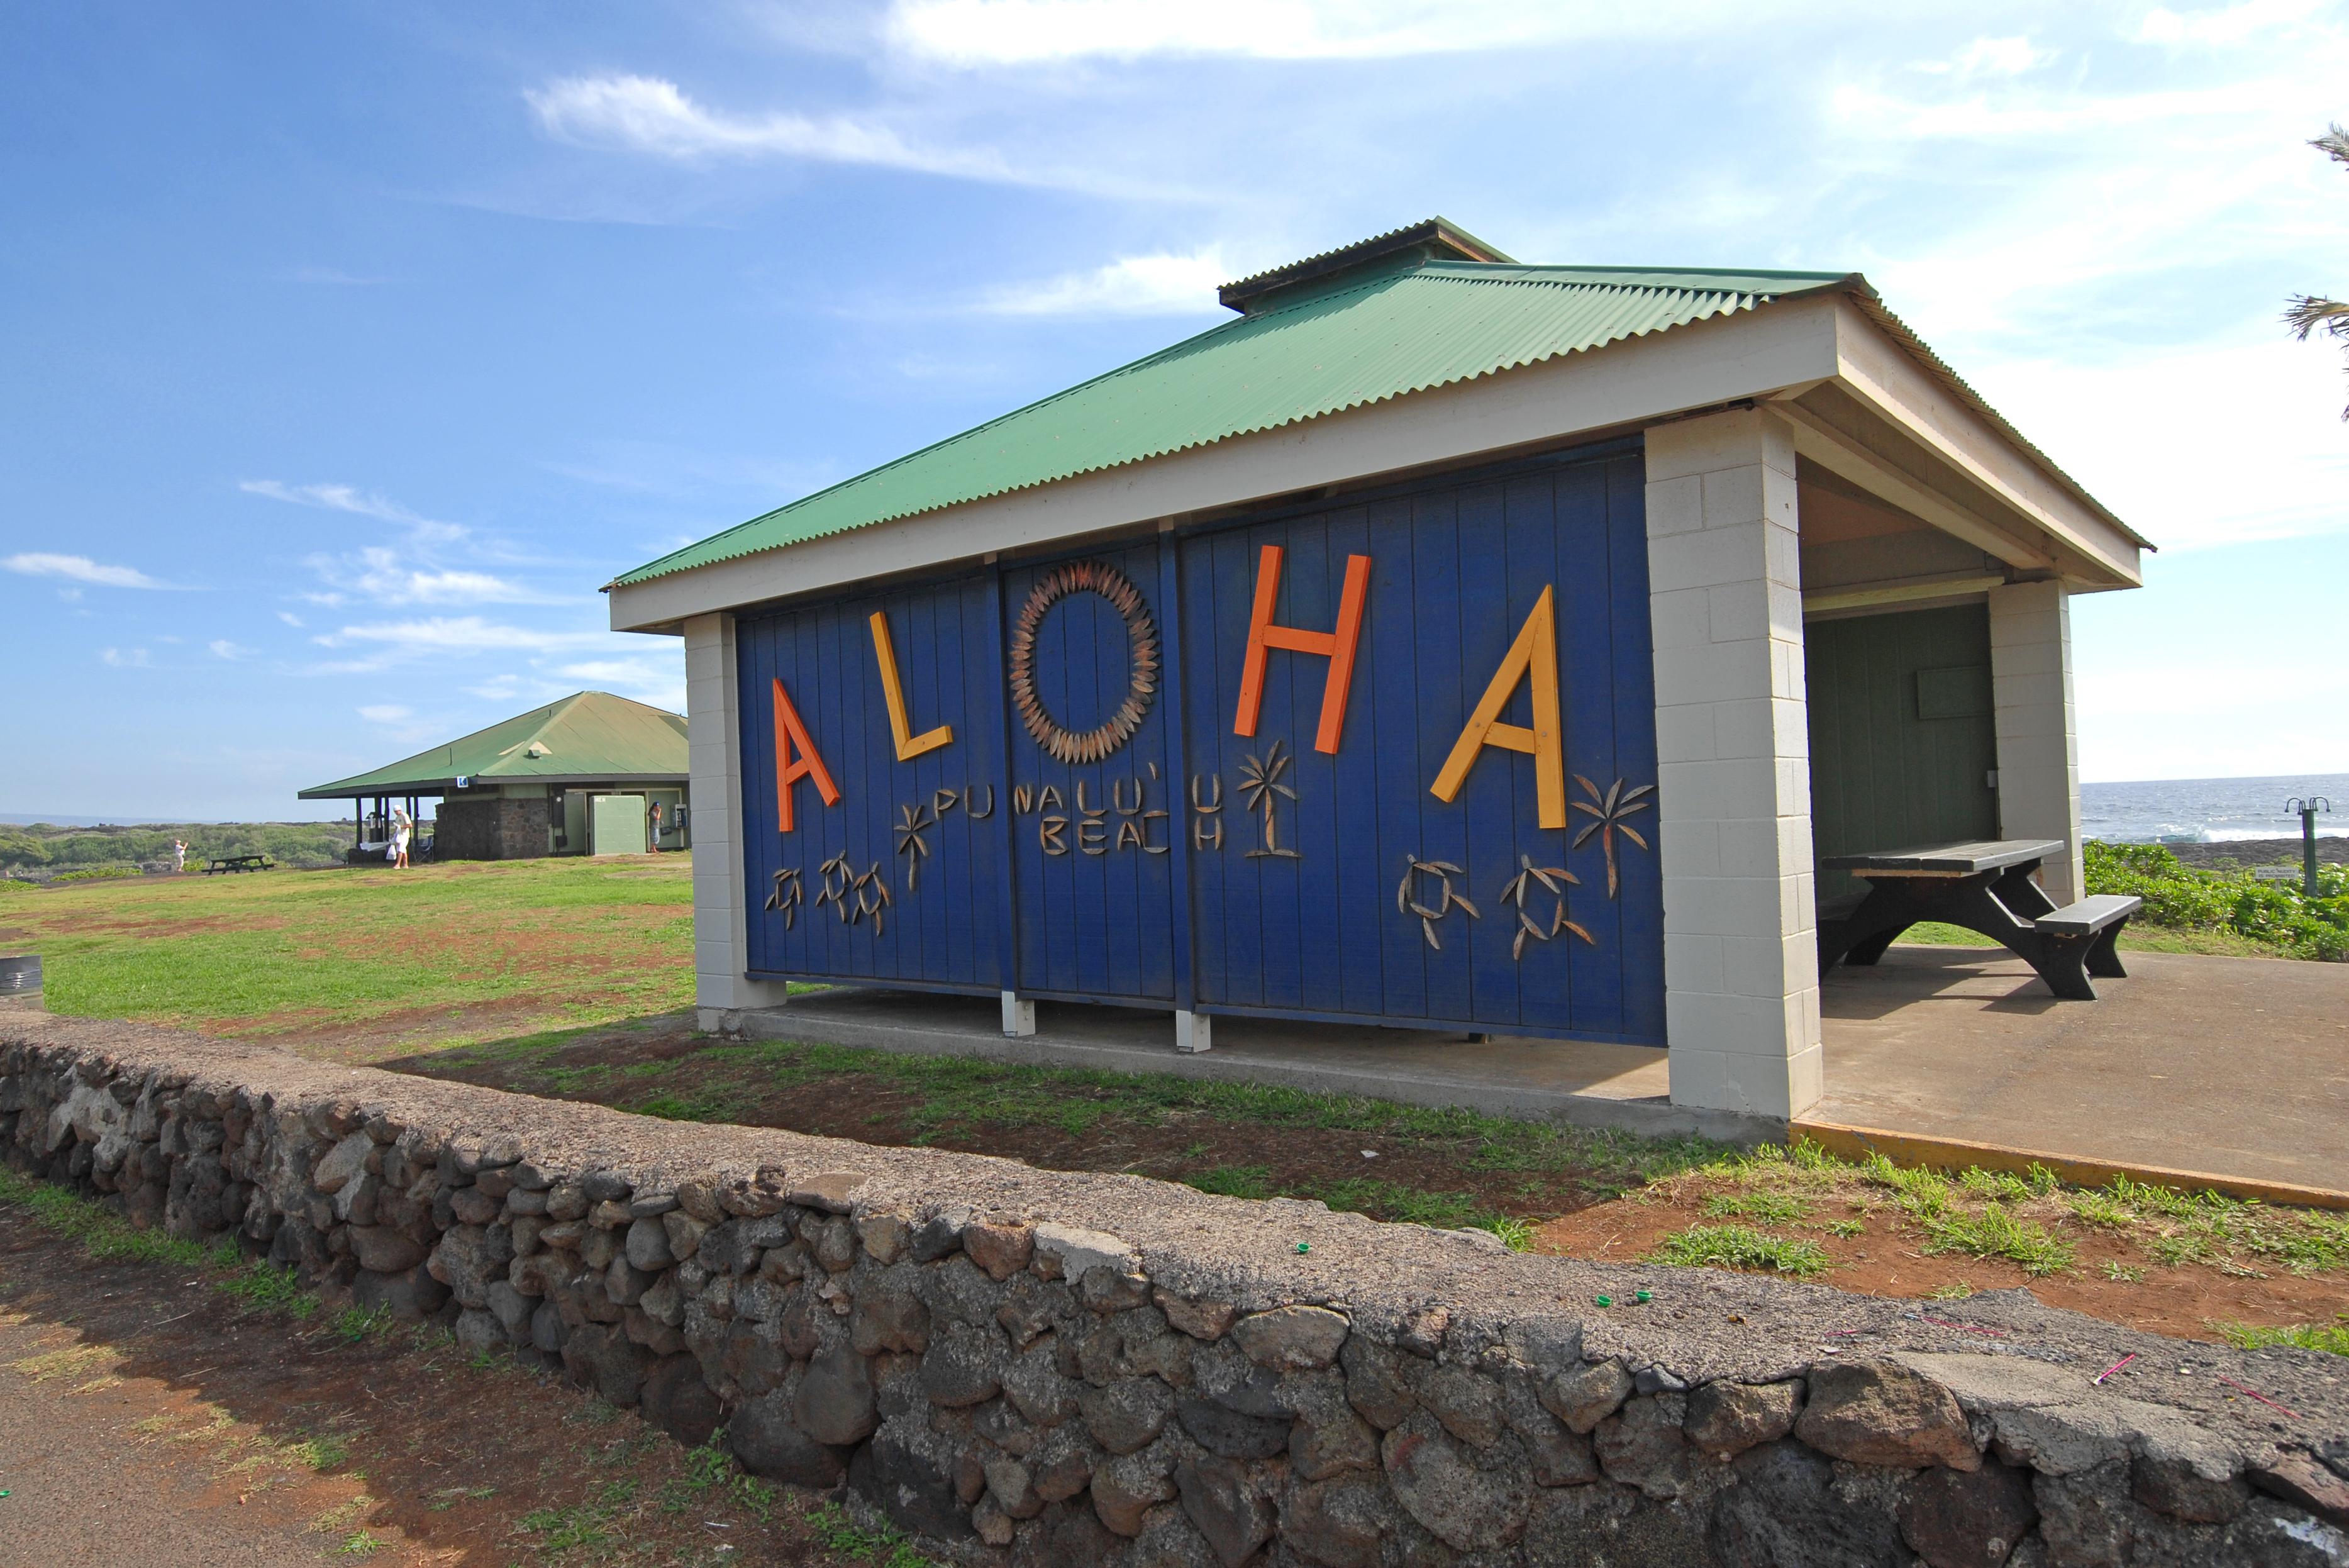 Welcome ALOHA Sign, Hawaii, USA